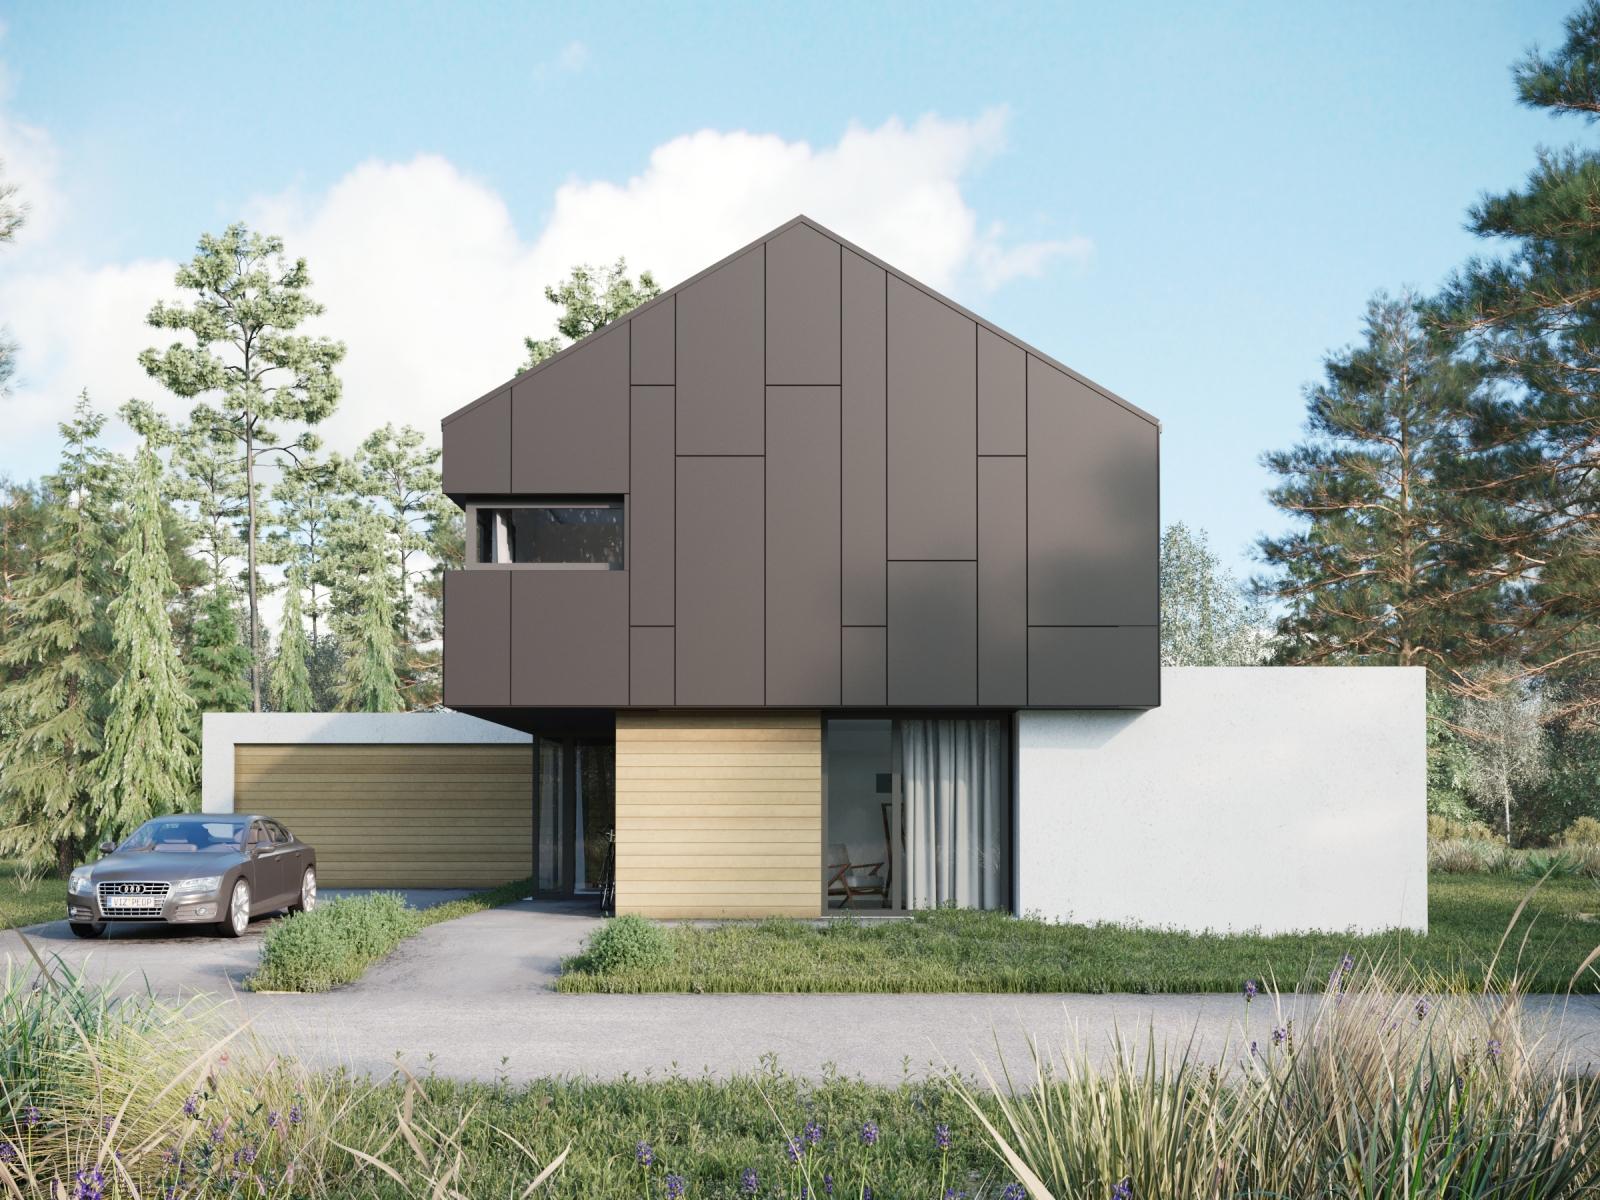 Visualization of a Modern Home